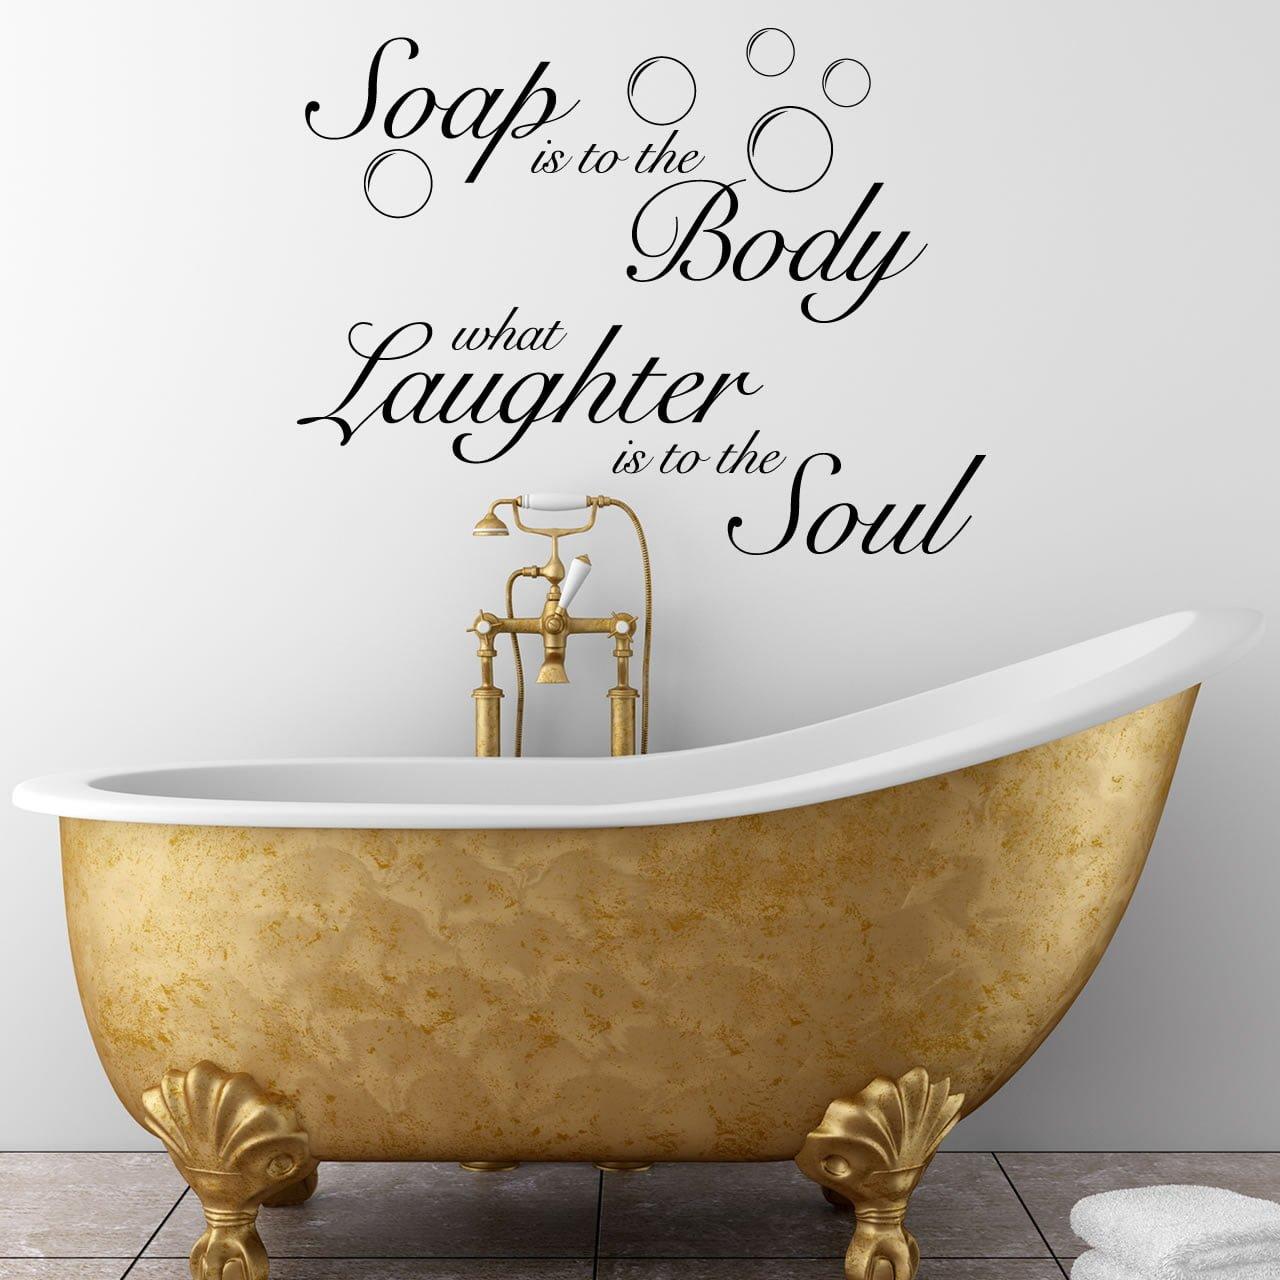 Bathroom Wall Sticker Inspirational Quote Ideas Soakology